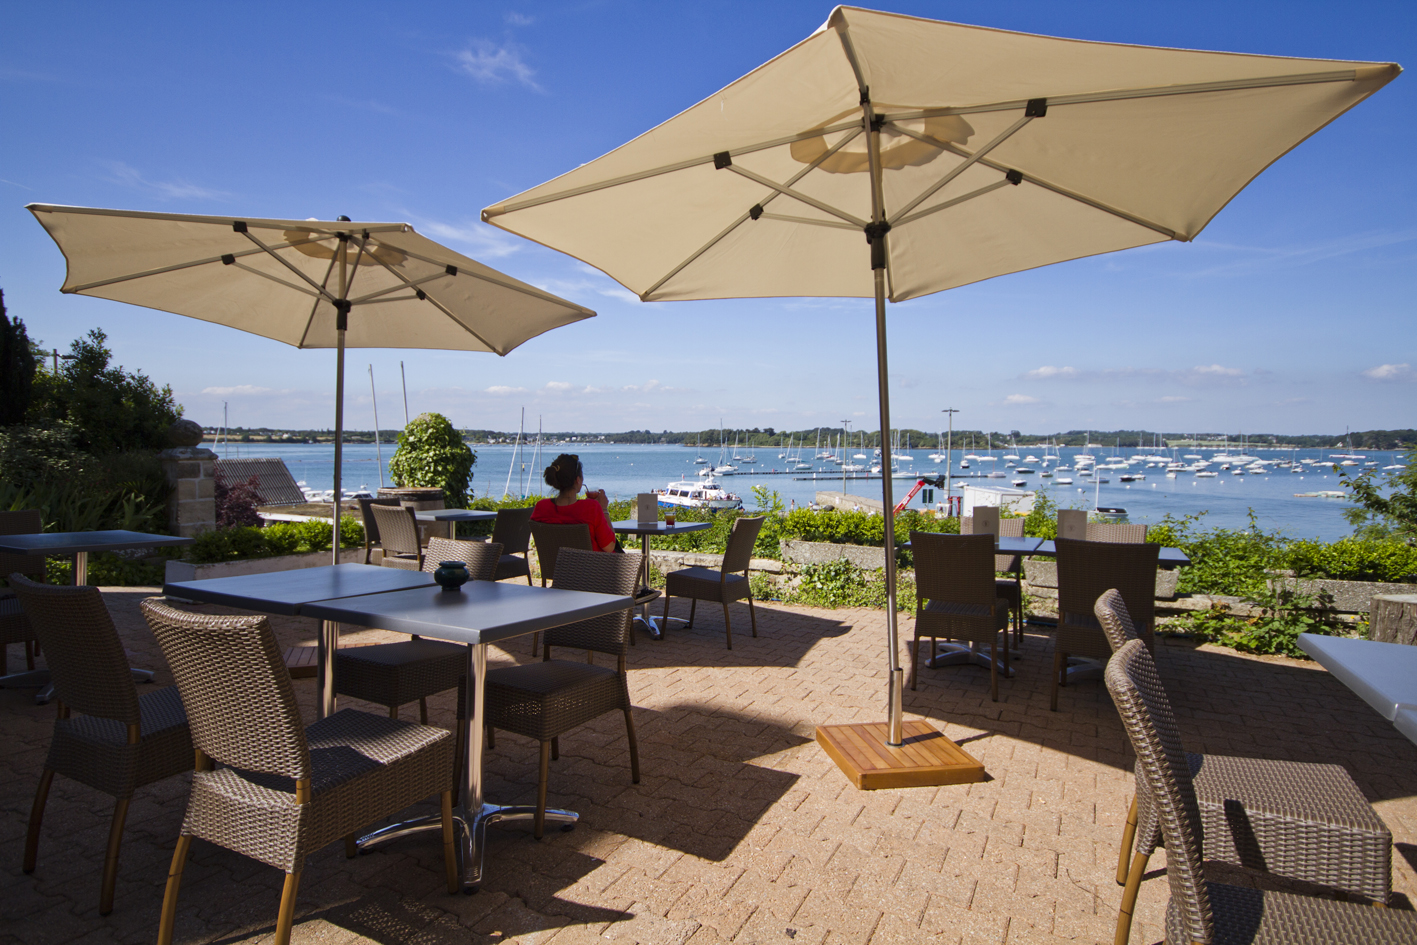 Terrasse restaurant Ile-aux-Moines